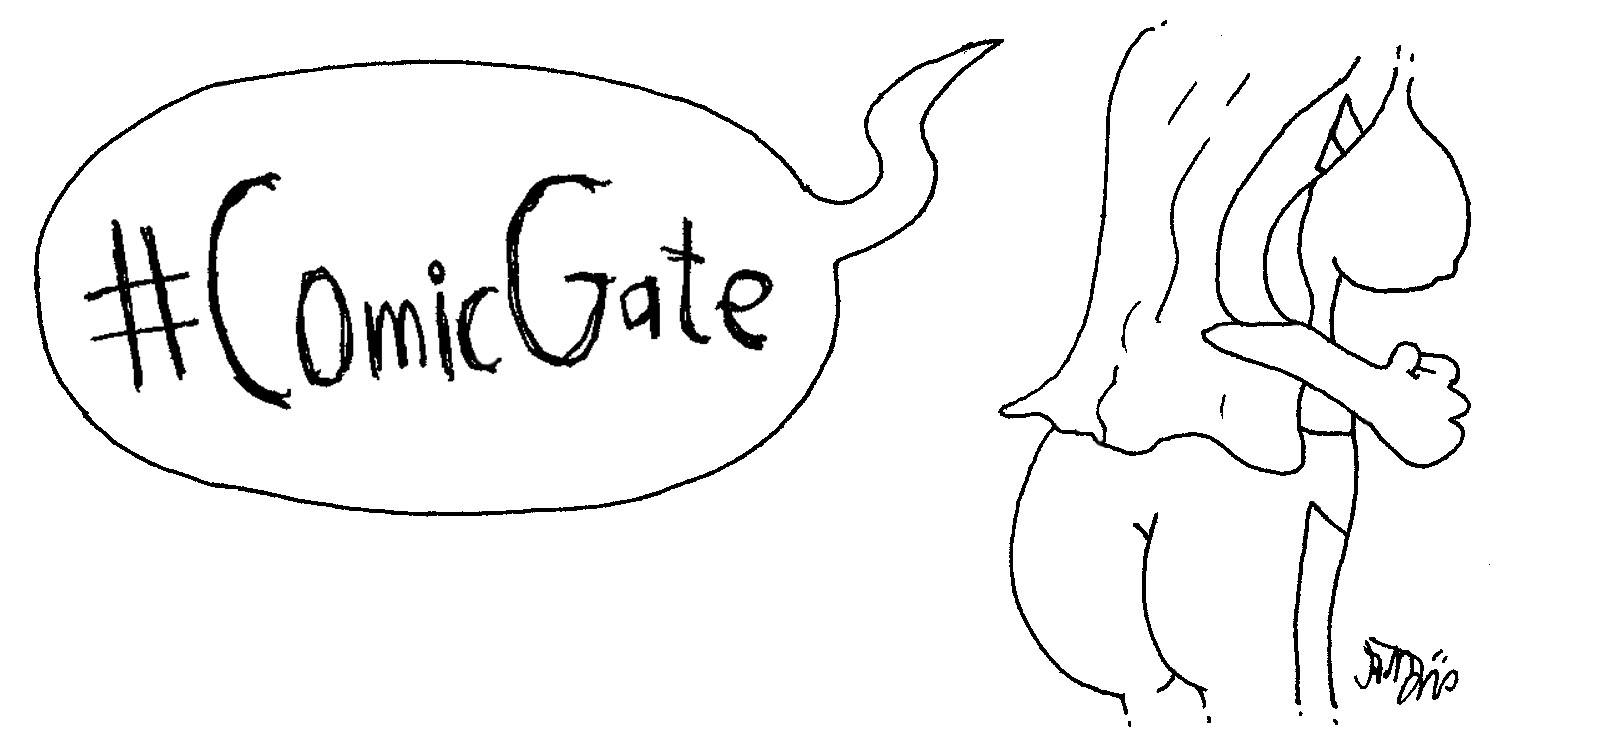 Titel ComicGate